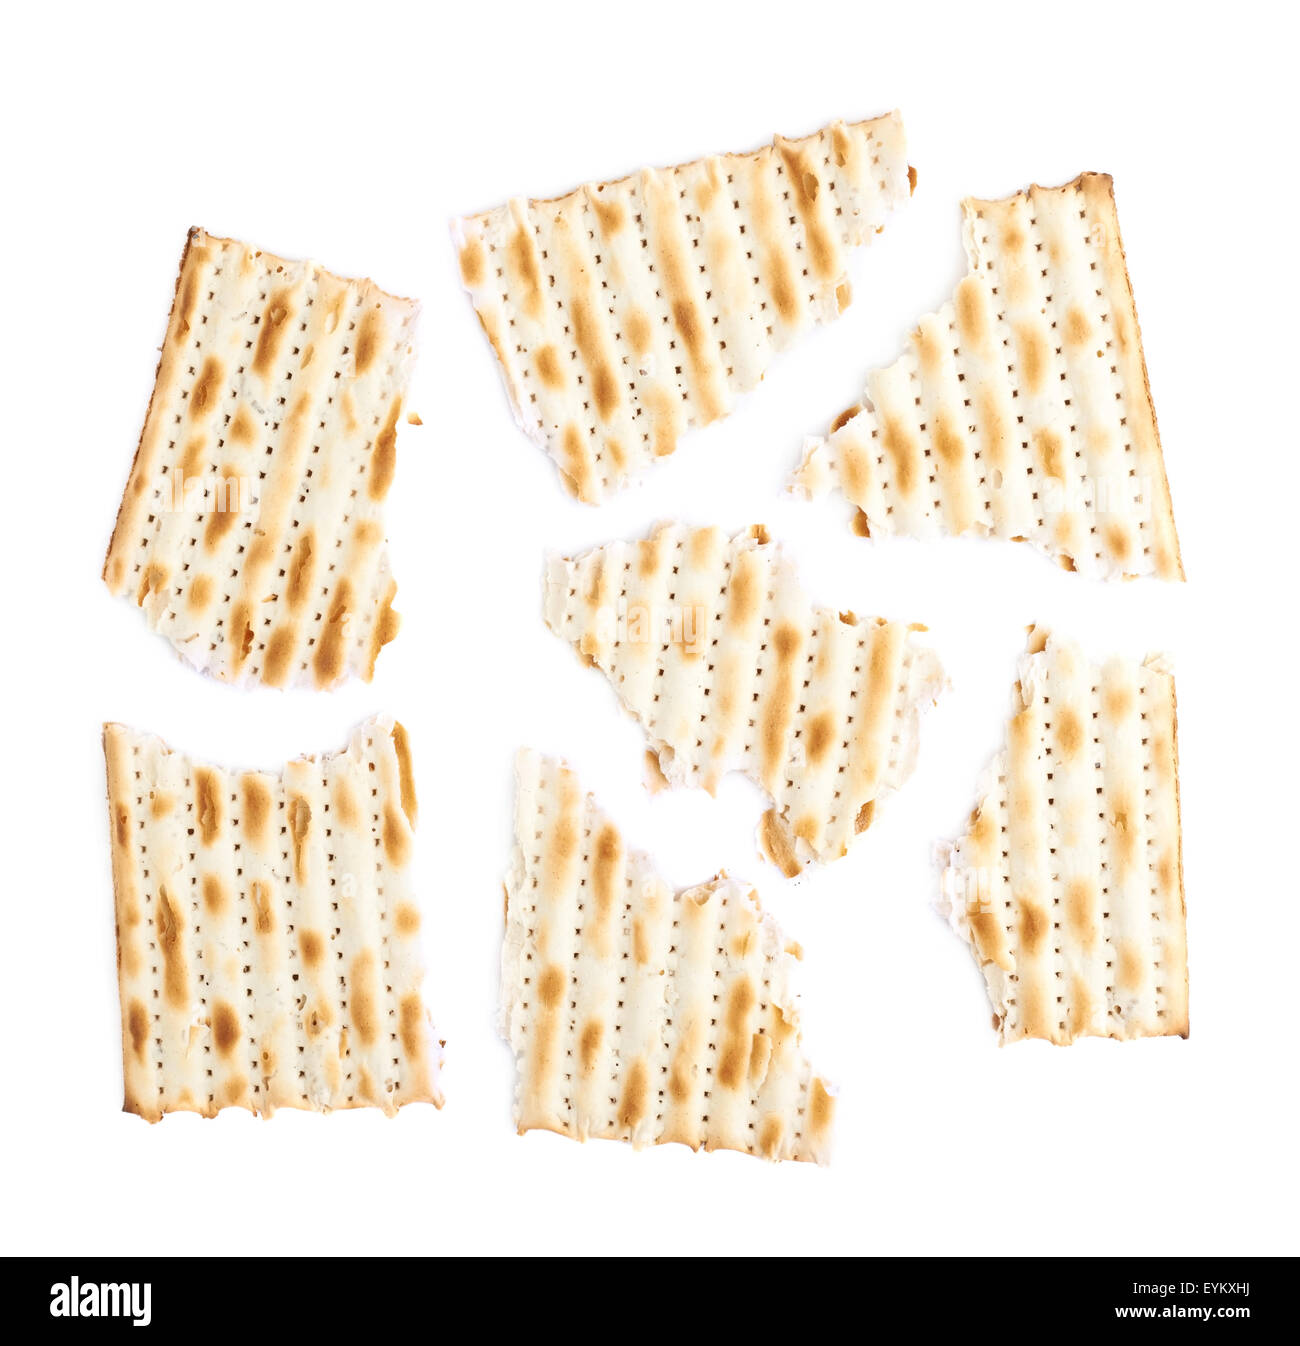 Cracked machine made matza flatbread - Stock Image